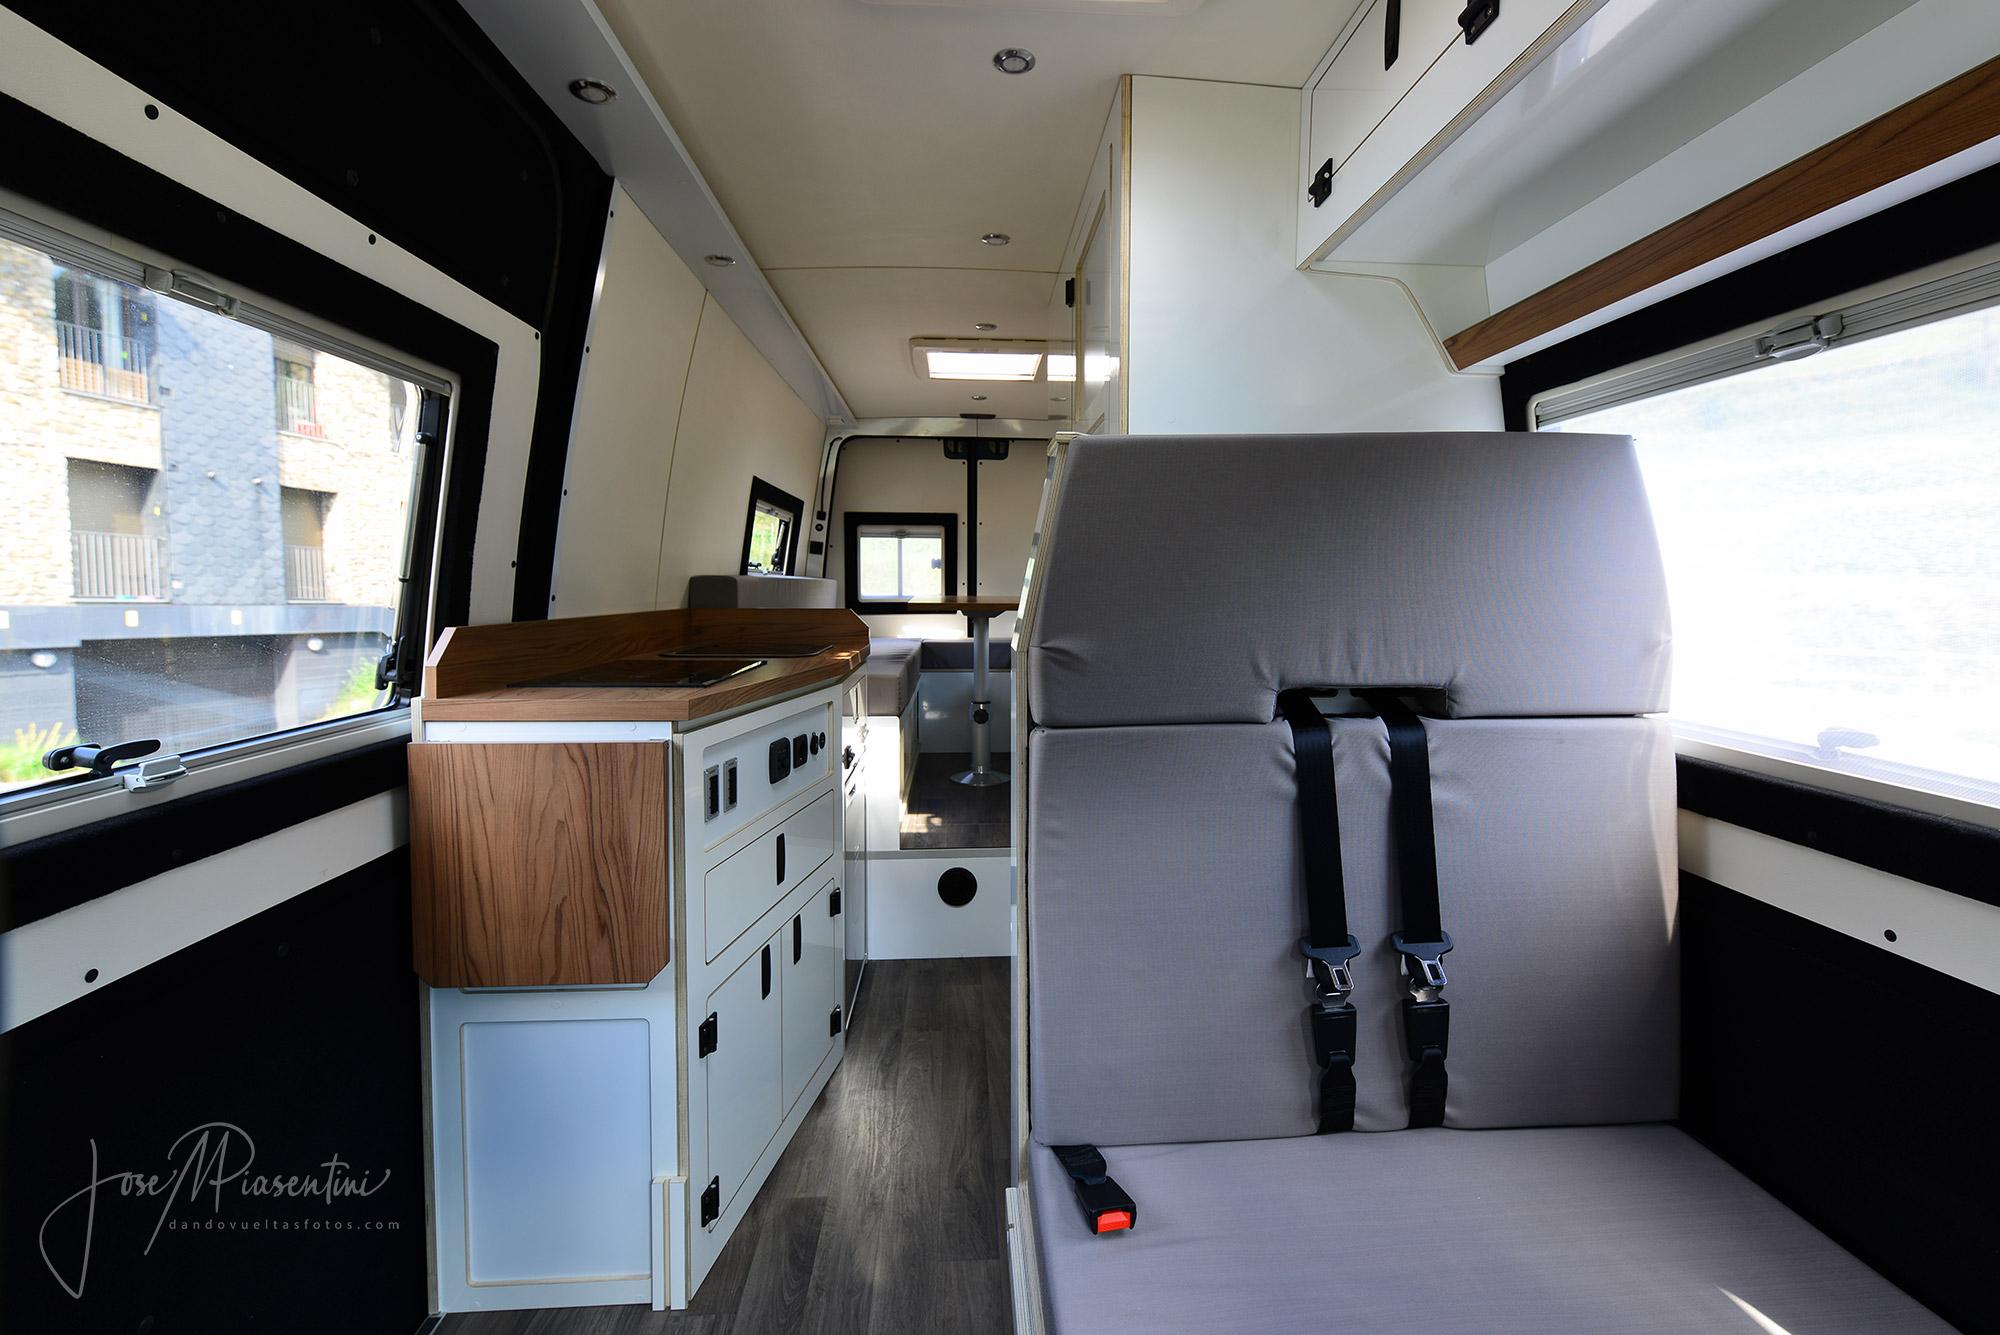 Mercedes Sprinter 4x4 camper